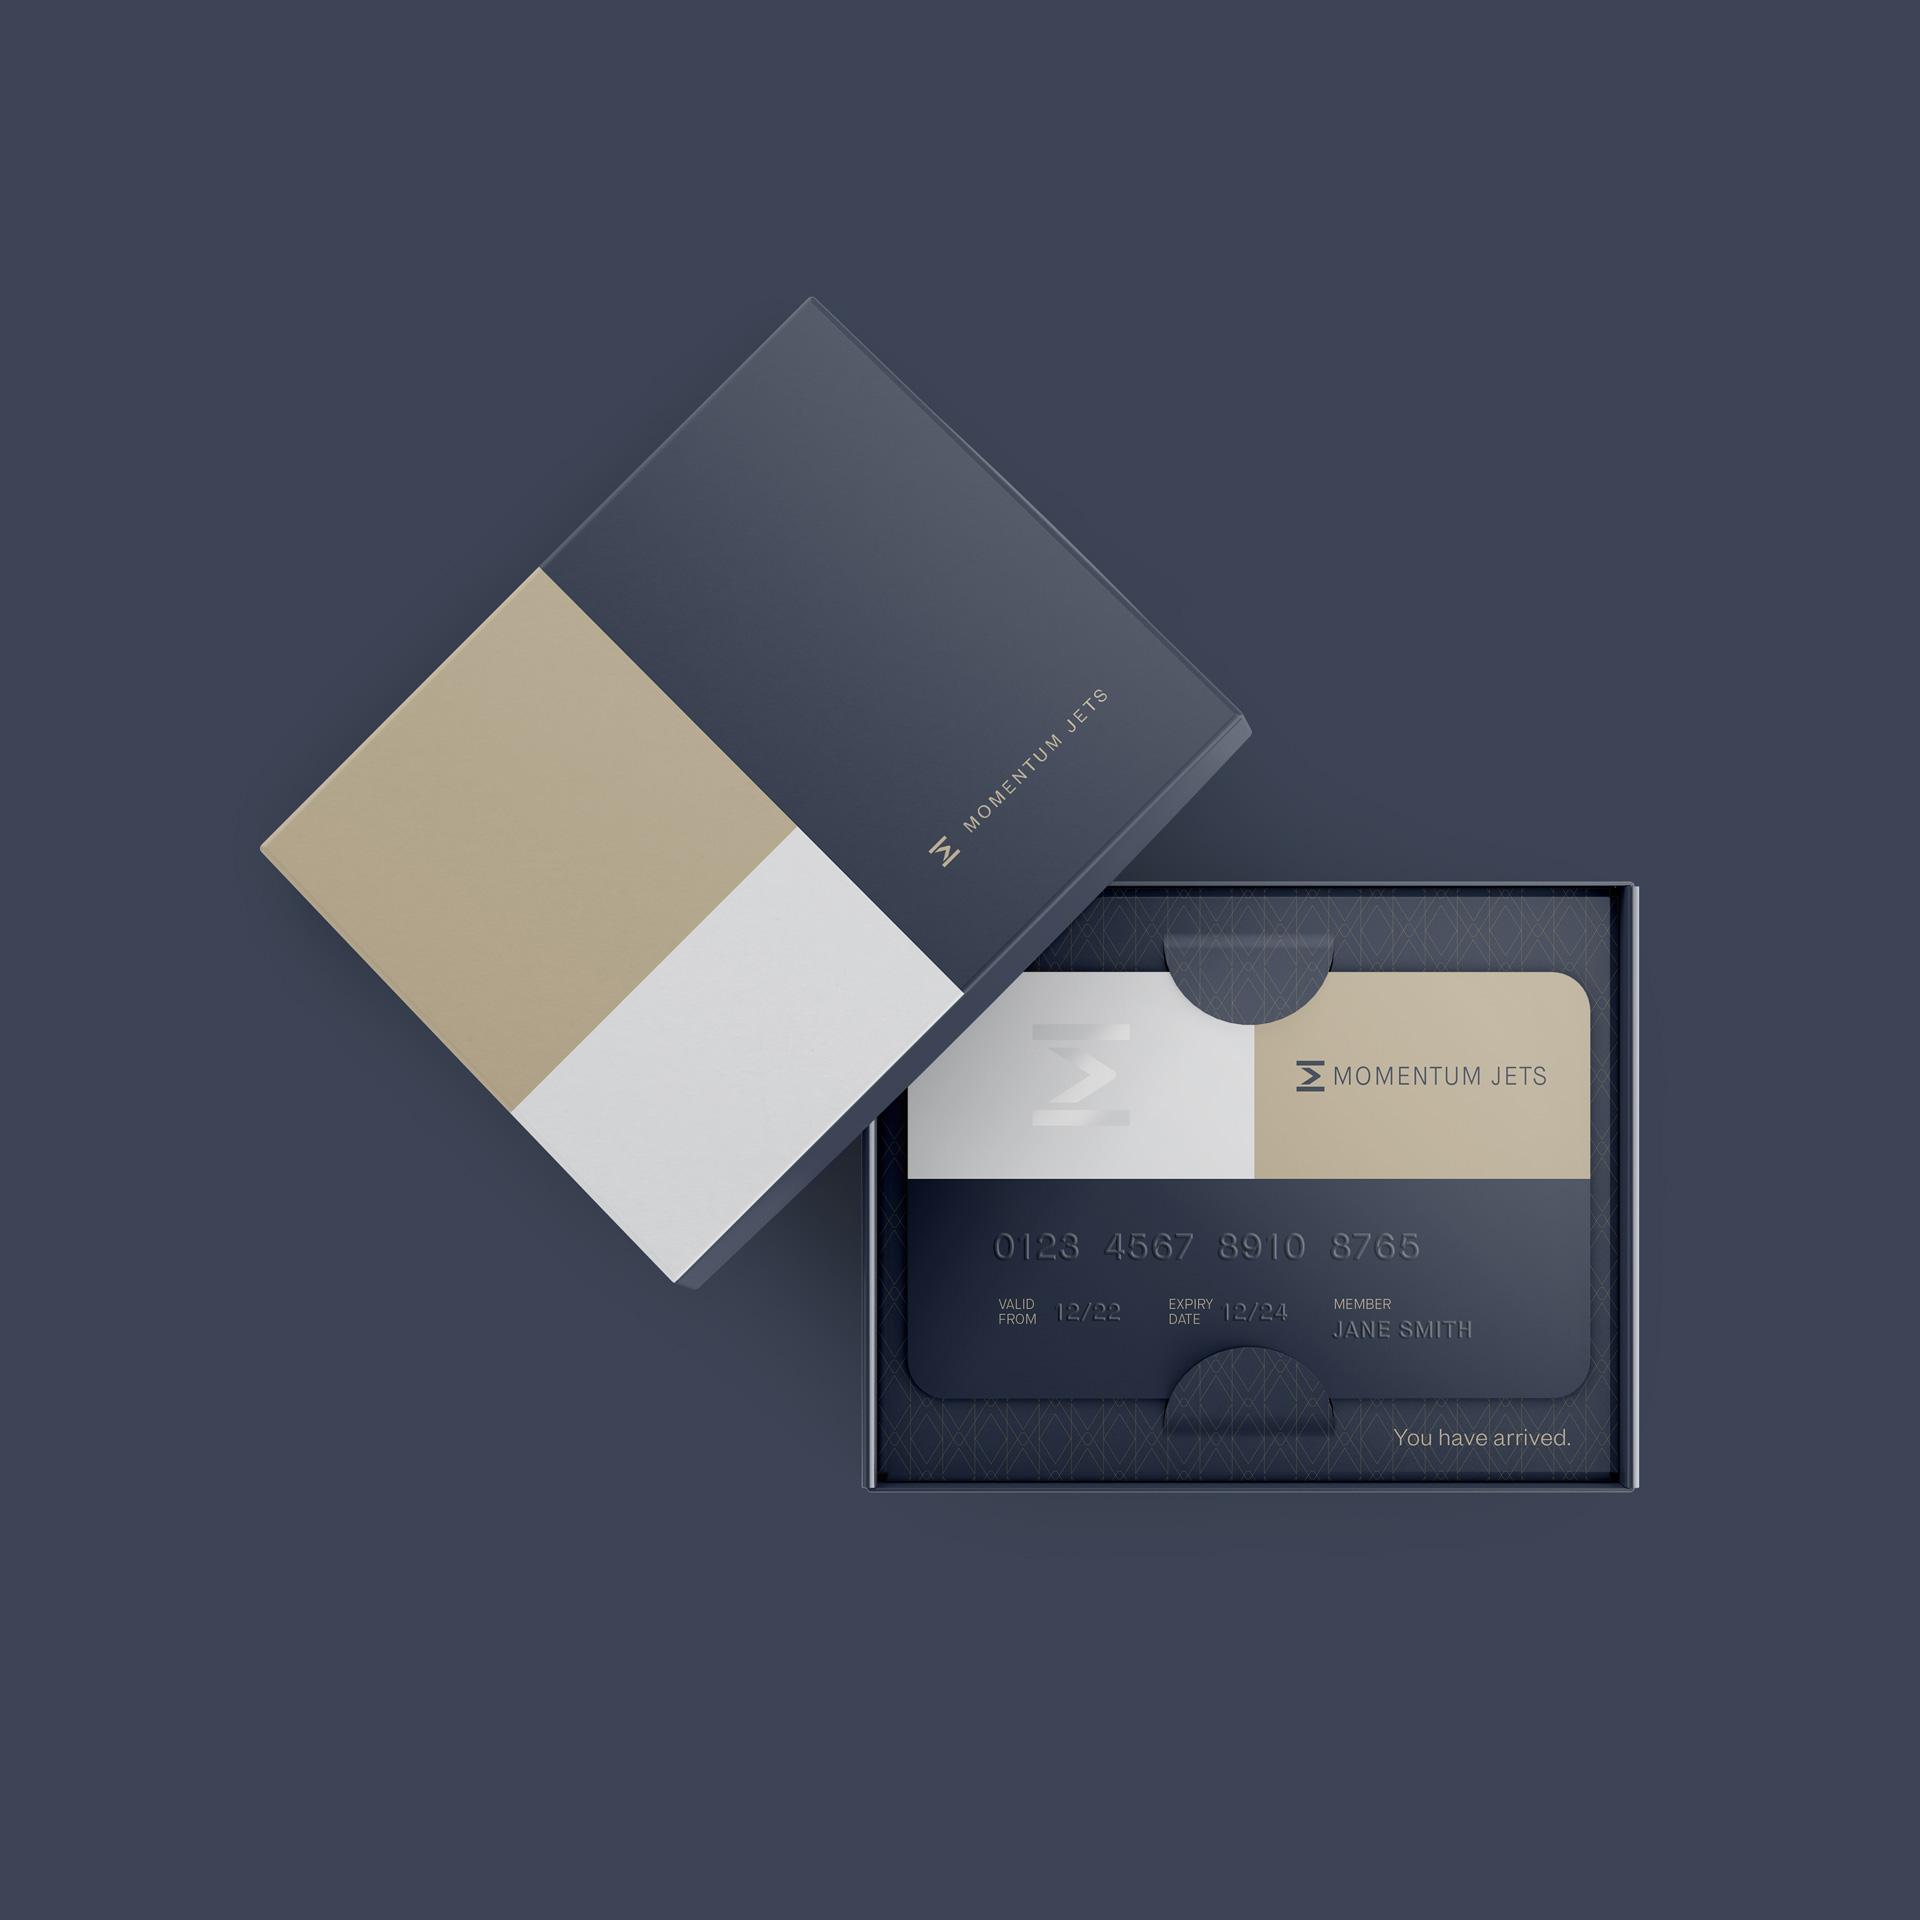 Momentum Jets membership card package design